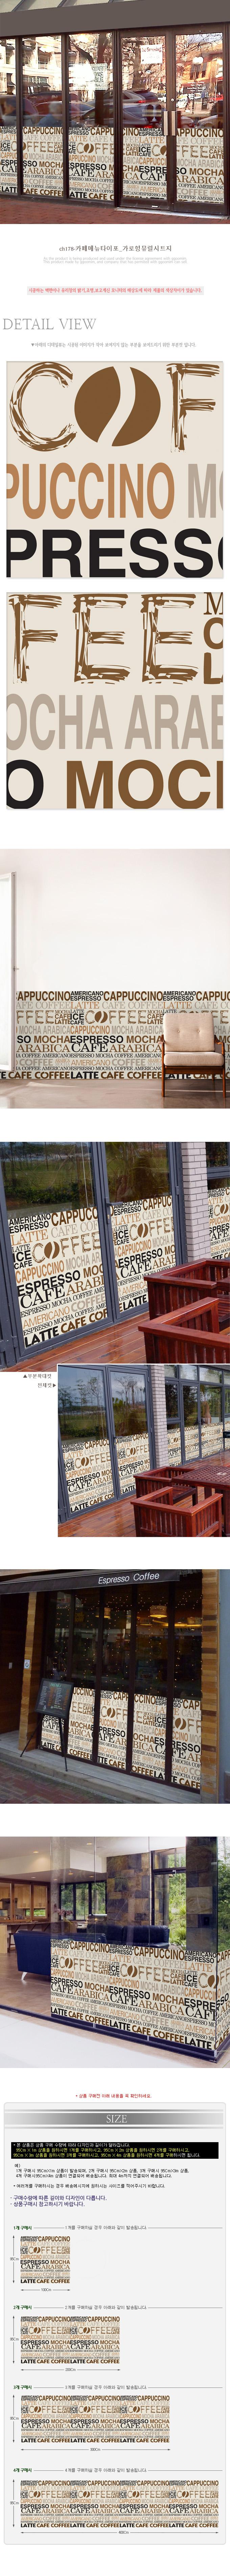 ch178-카페메뉴타이포_가로형뮤럴시트지_뮤럴시트지 - 꾸밈, 22,400원, 벽지/시트지, 디자인 시트지